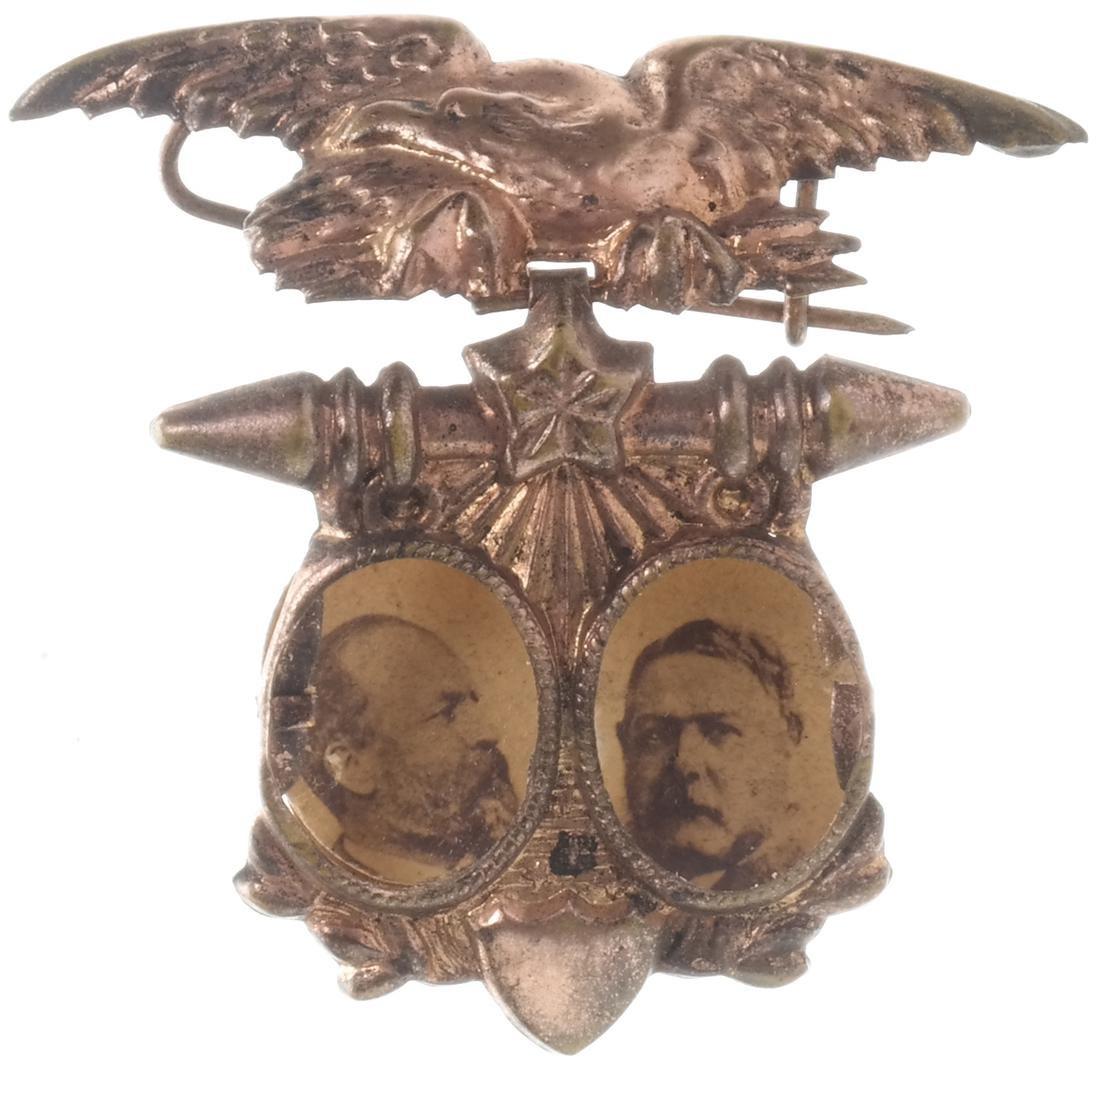 GARFIELD & ARTHUR 1880 JUGATE ALBUMEN BADGE